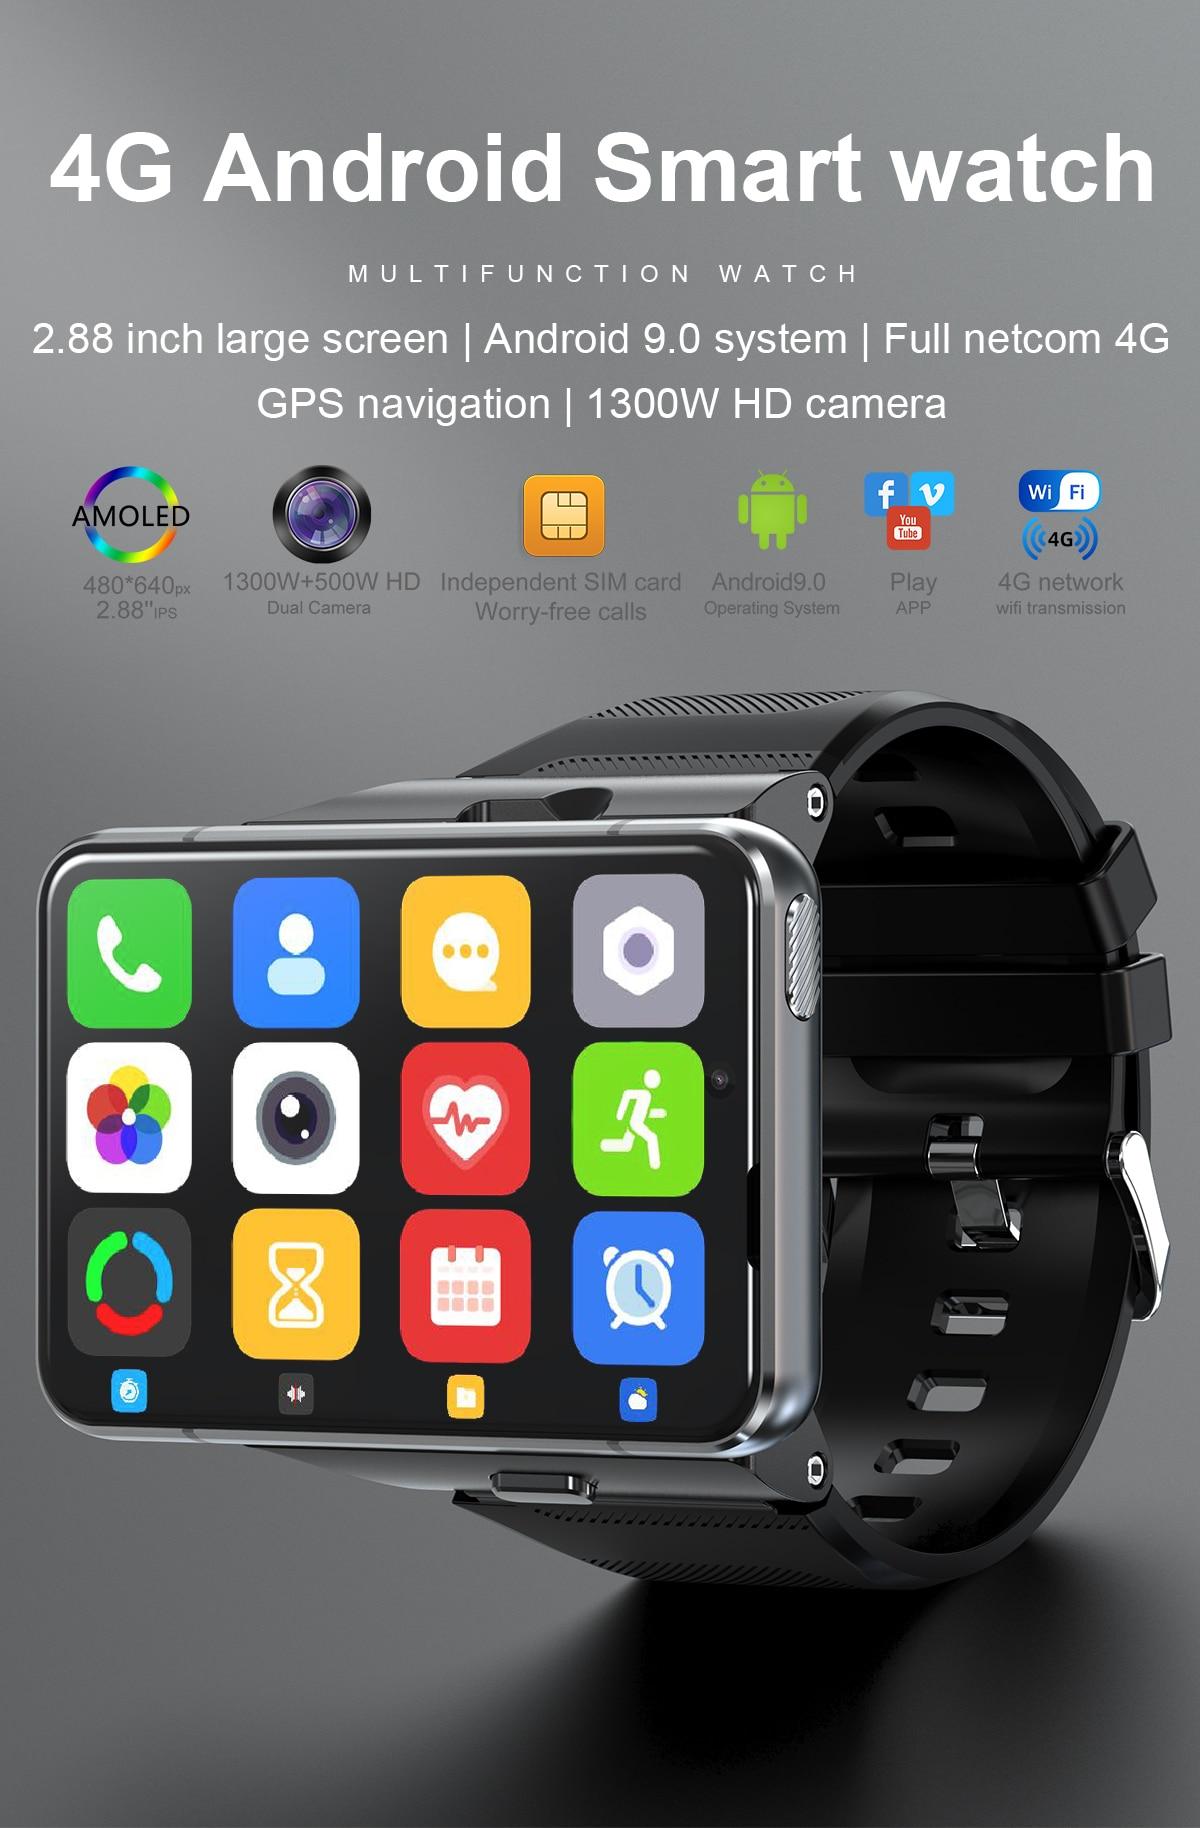 S999 ساعة ذكية 2.88 بوصة 4G ساعة ذكية أندرويد 9 64gb بلوبوث 13MP كاميرا نظام تحديد المواقع ساعة واي فاي ارتداء Os جوجل